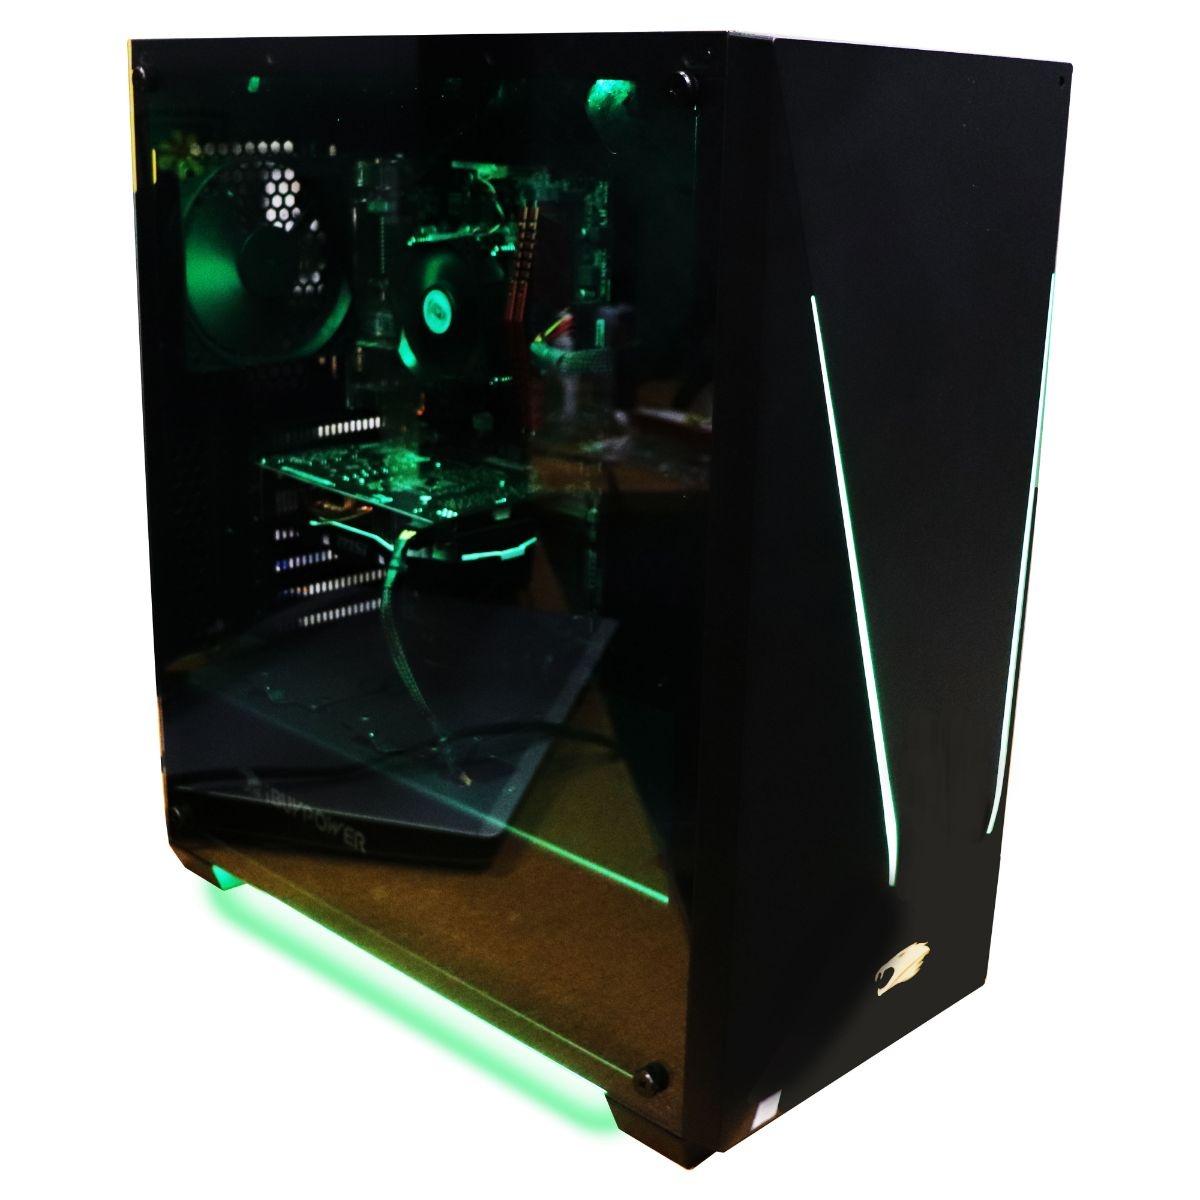 IBUYPOWER Gaming Desktop Intel i7-7700 Nvidia GTX 1060 3GB 16GB DDR4 1TB HDD (Refurbished)